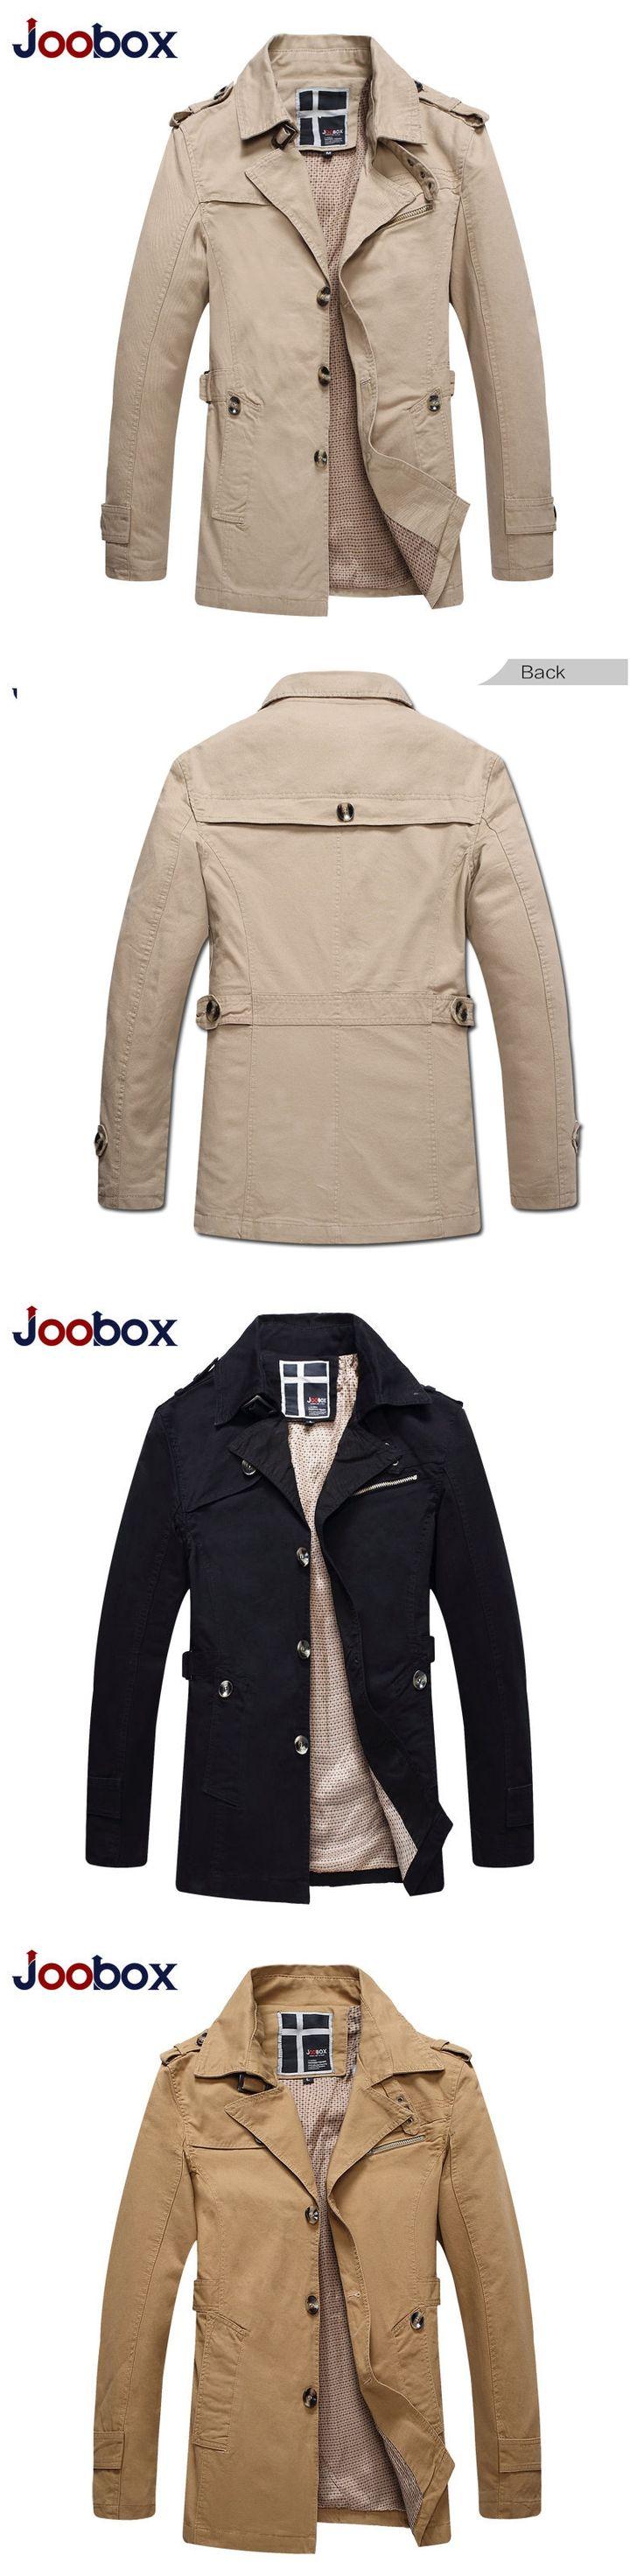 bape Men's jacket with fleece jacket windproof coat jacket male bomber flight military coat leather winter men bape raincoat 27